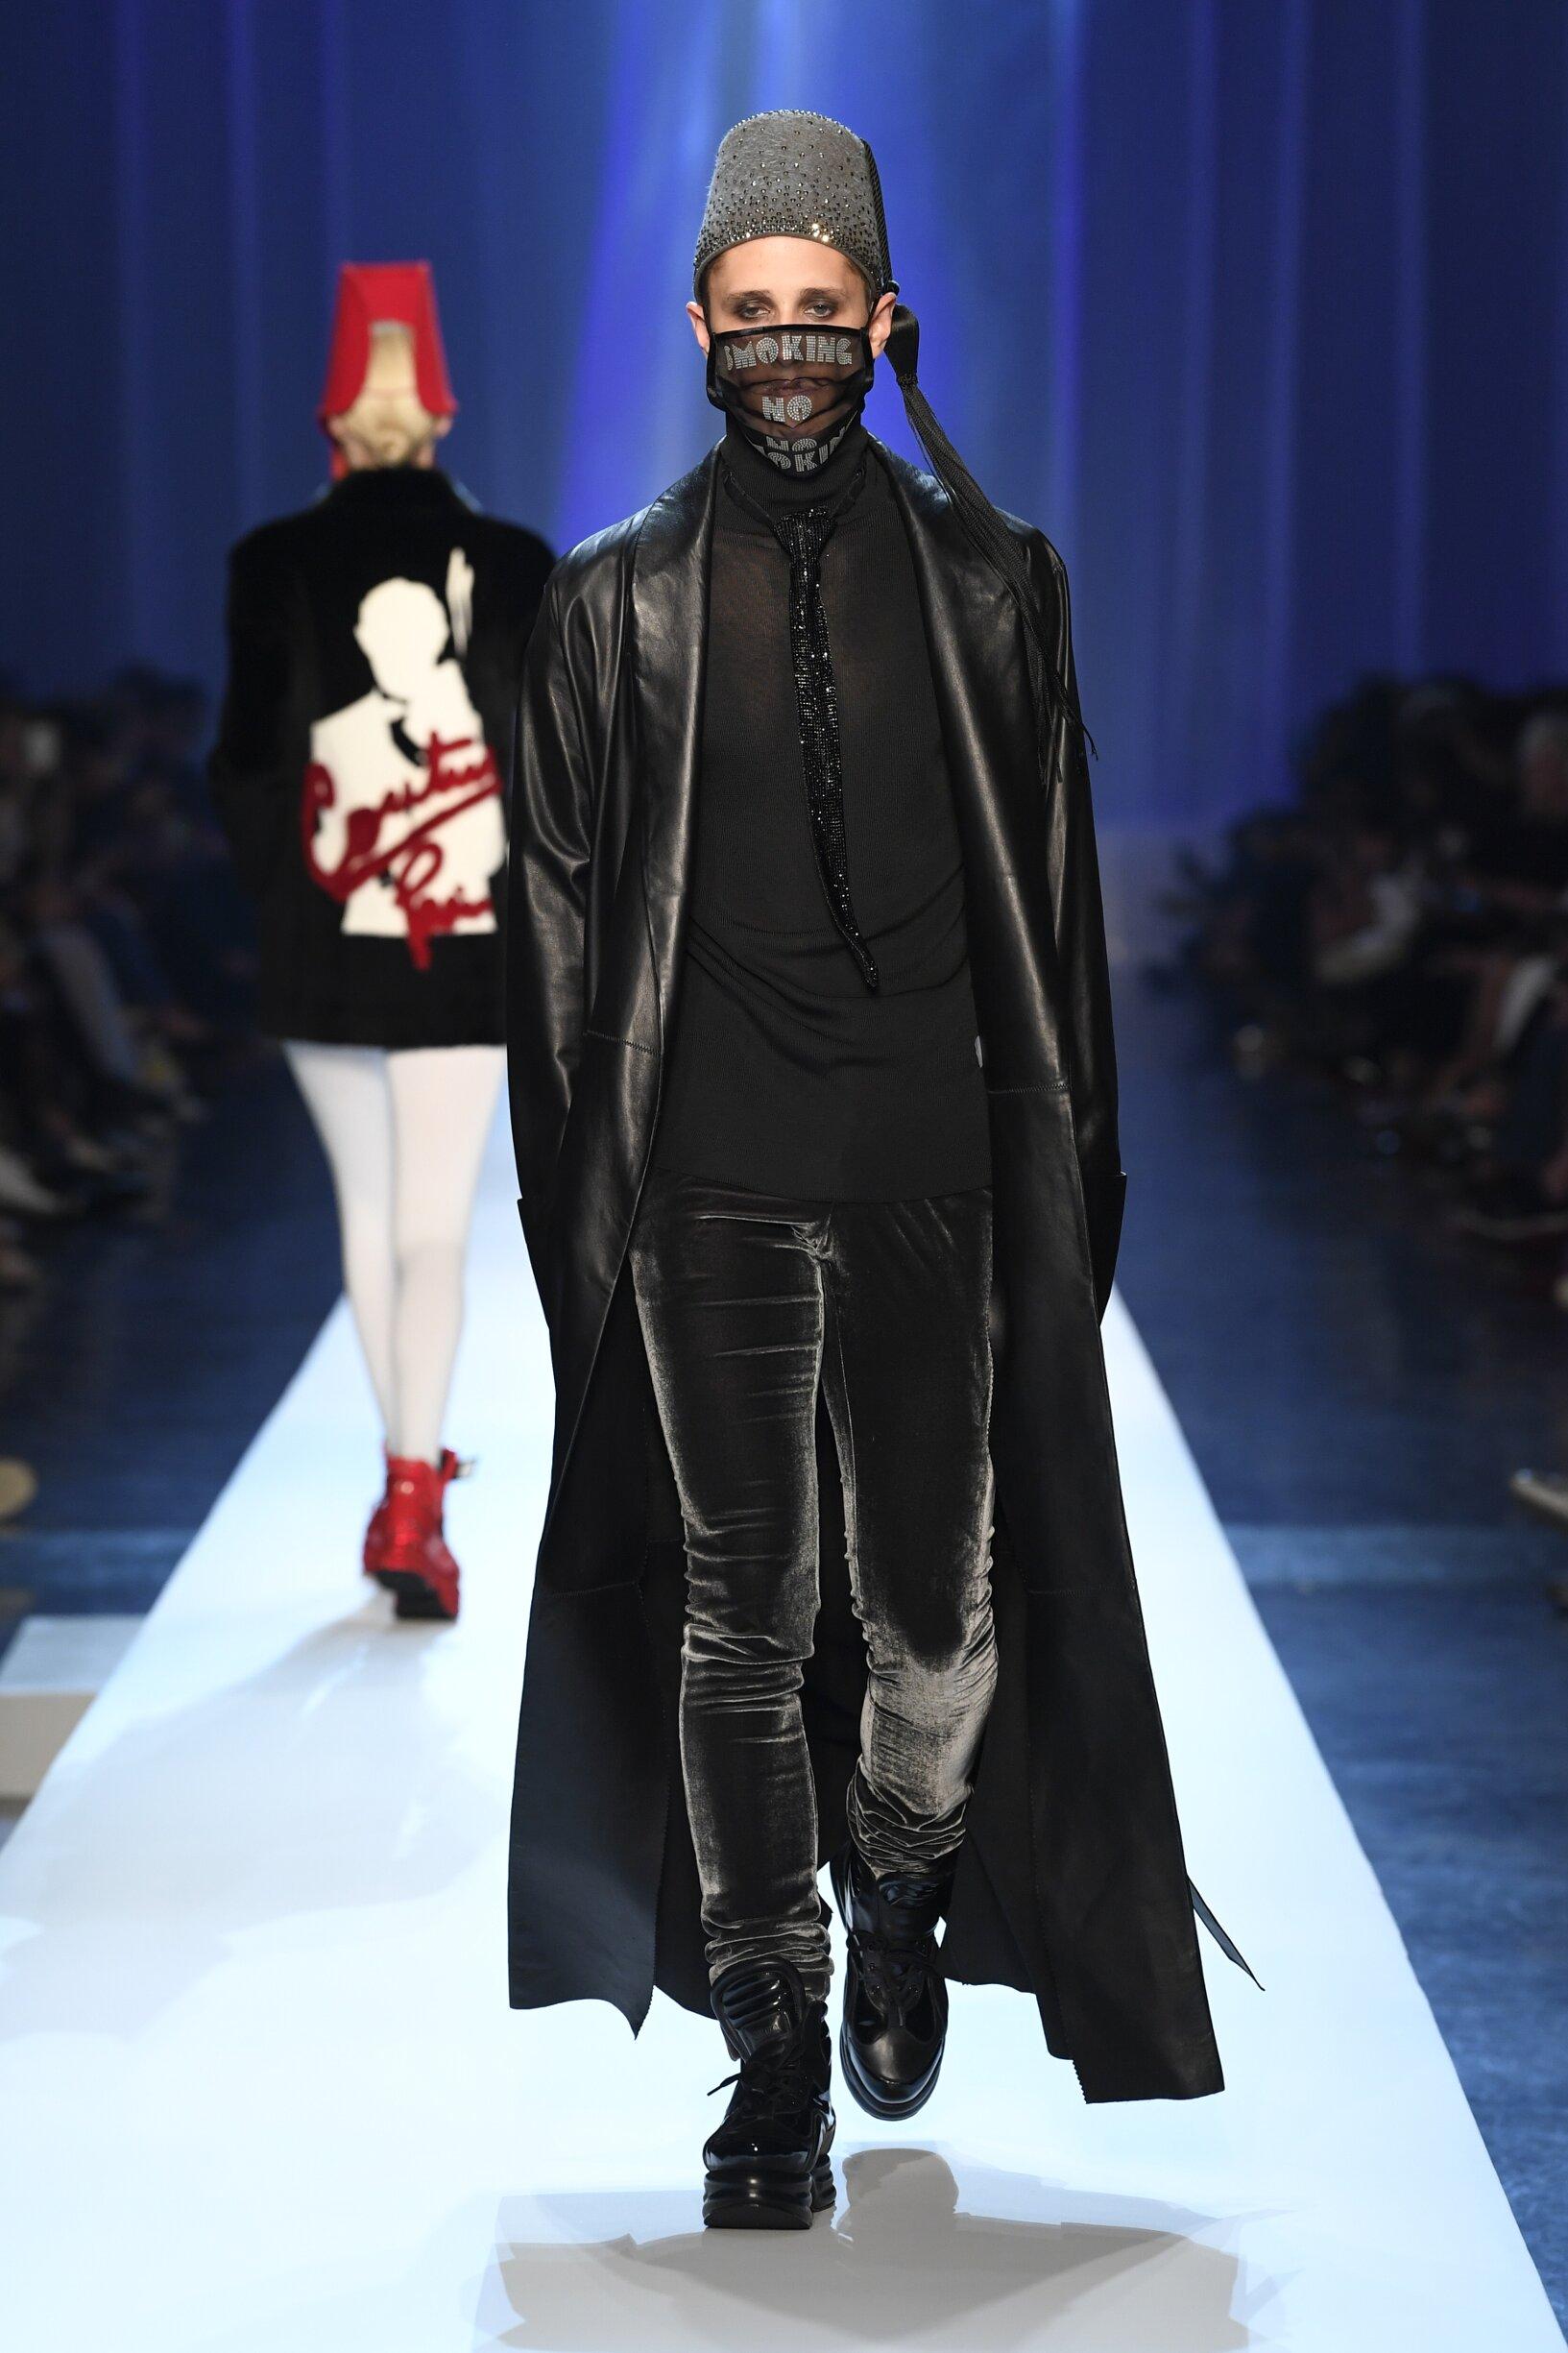 Winter 2018 Fashion Trends Jean-Paul Gaultier Haute Couture